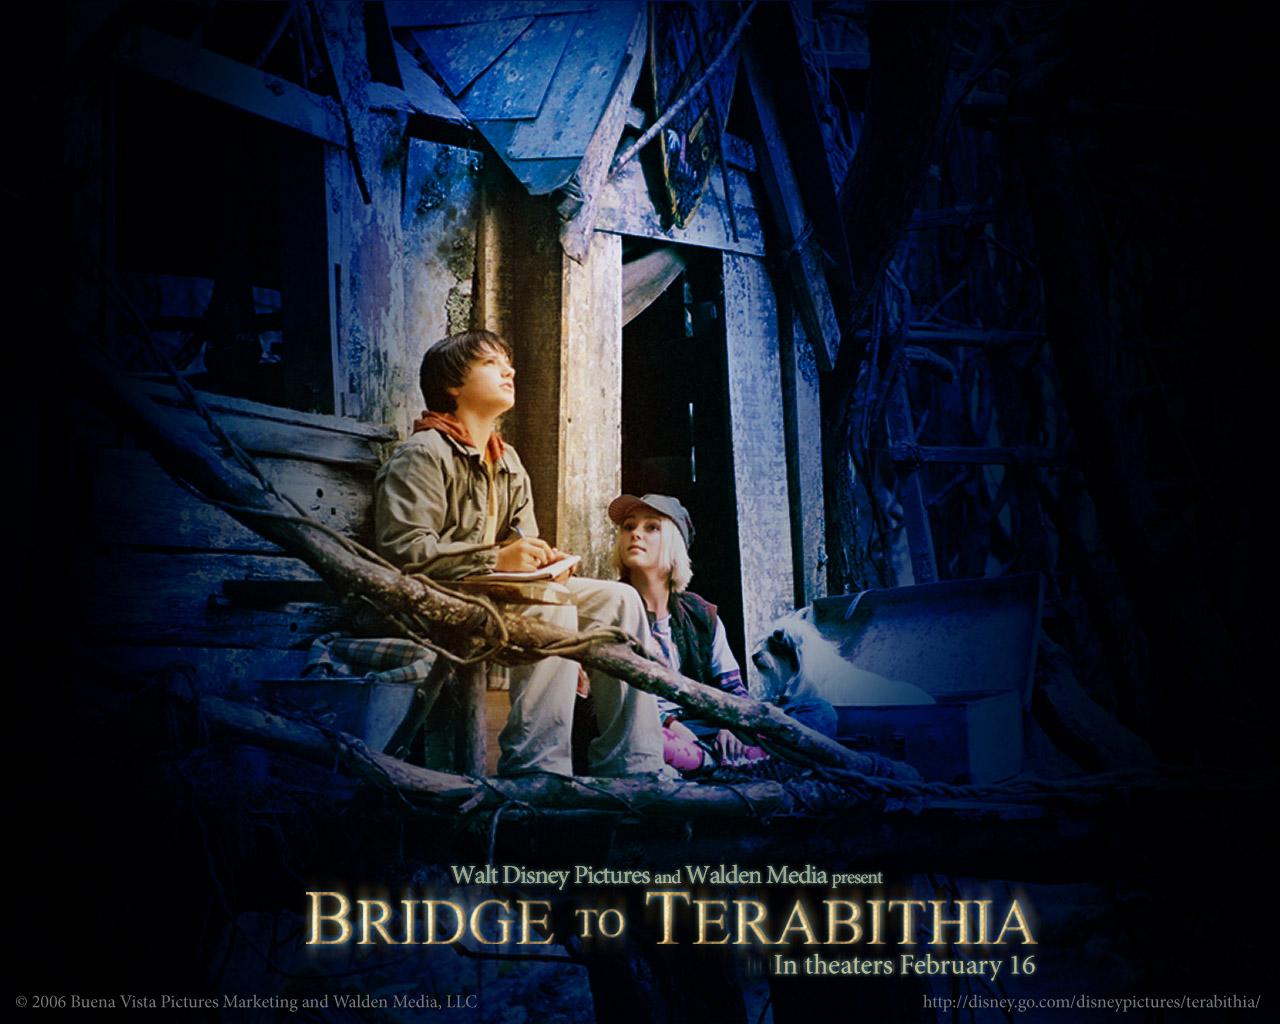 Bridge to Terabithia - IMDb